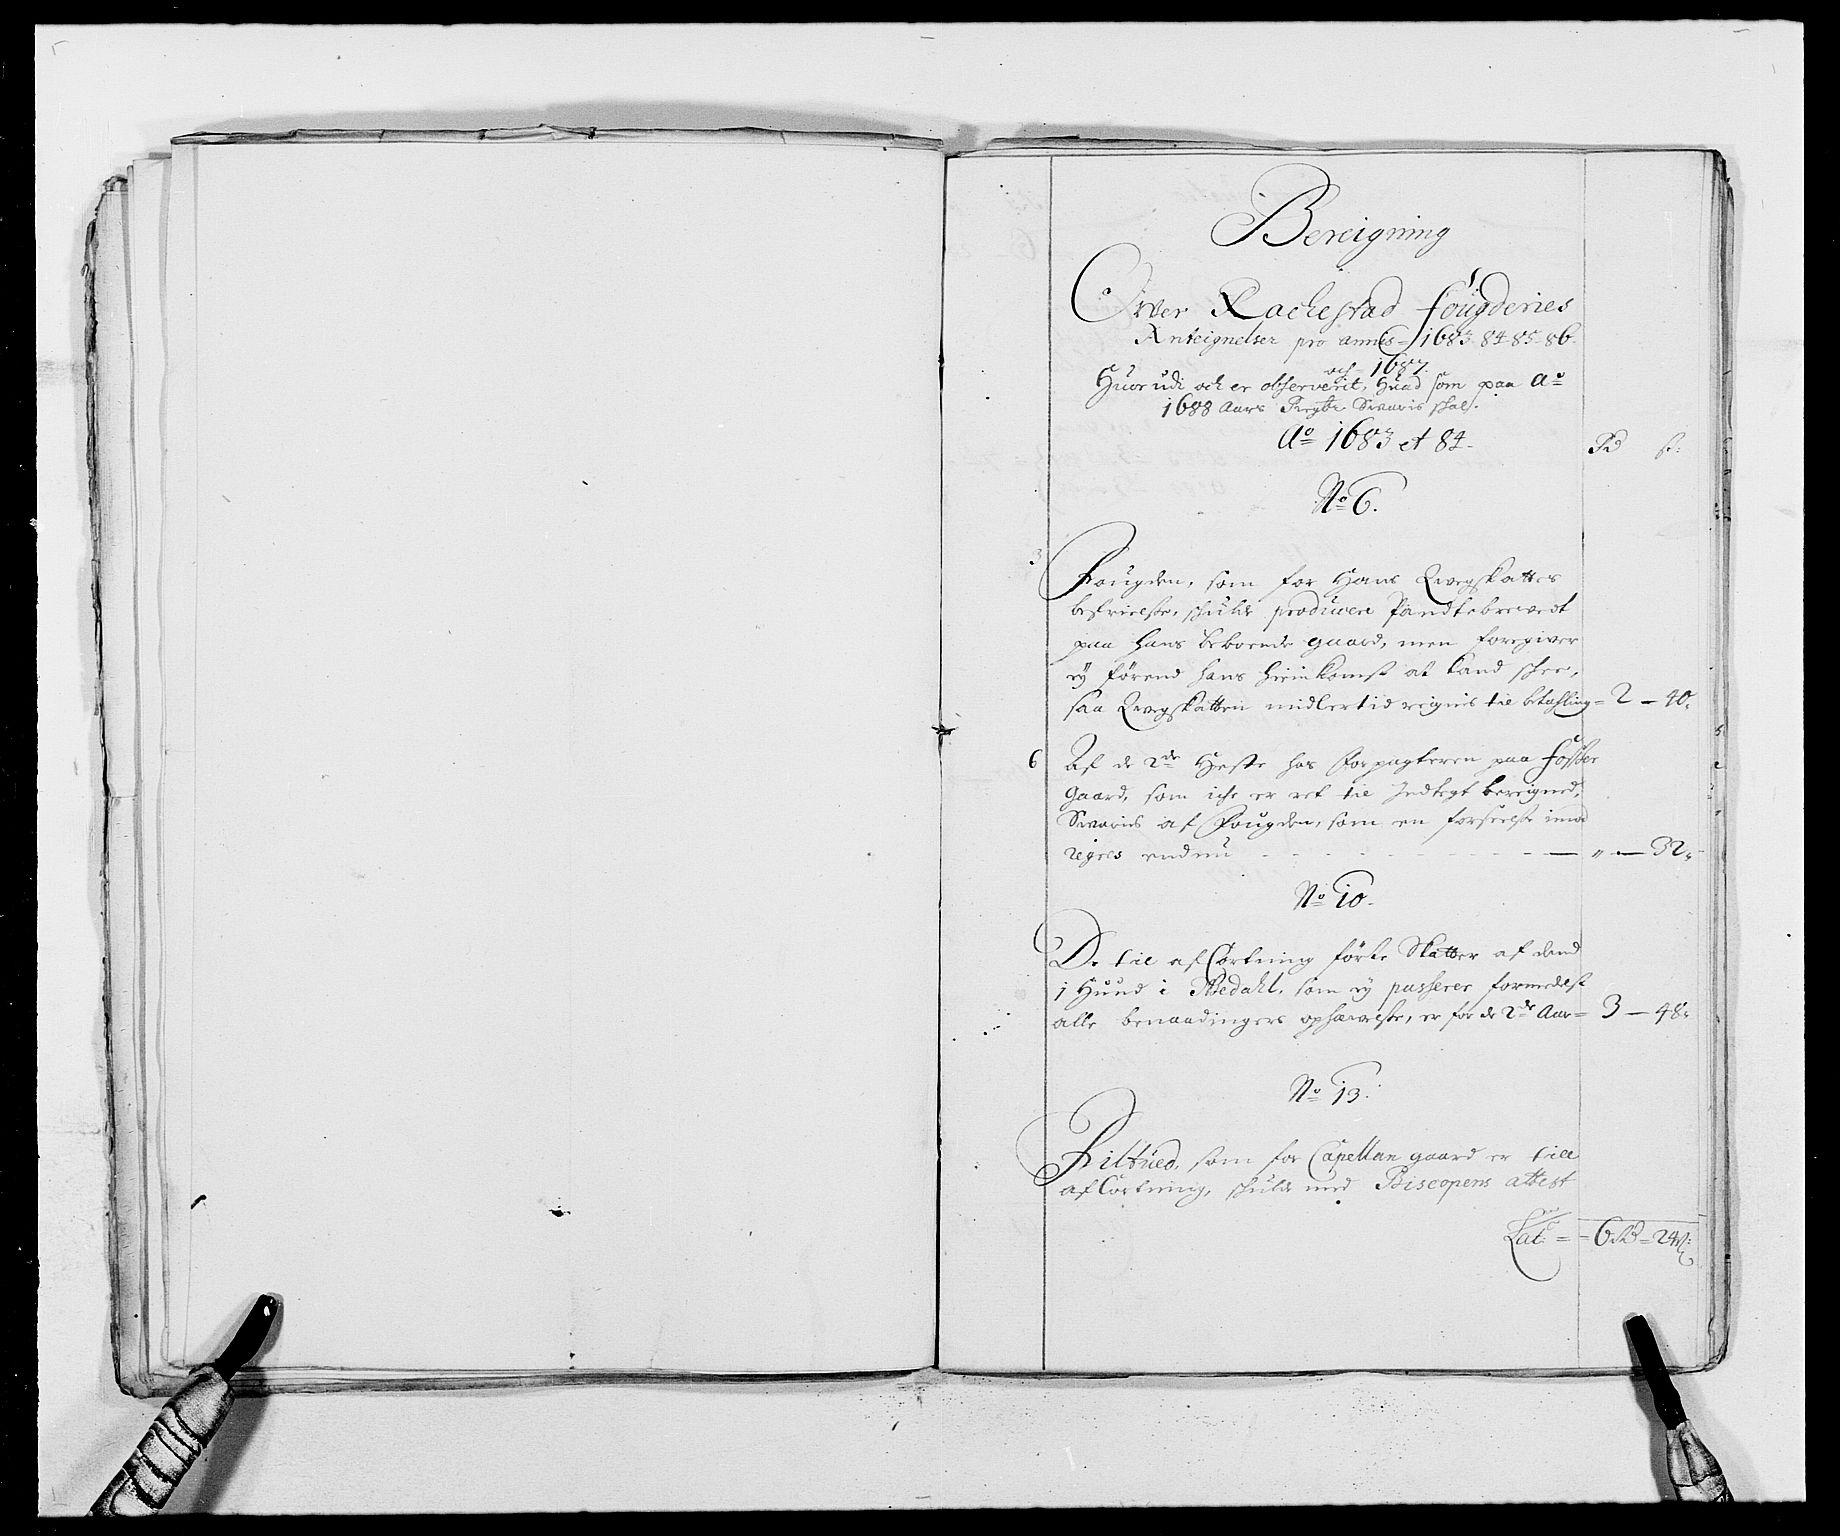 RA, Rentekammeret inntil 1814, Reviderte regnskaper, Fogderegnskap, R05/L0276: Fogderegnskap Rakkestad, 1683-1688, s. 397